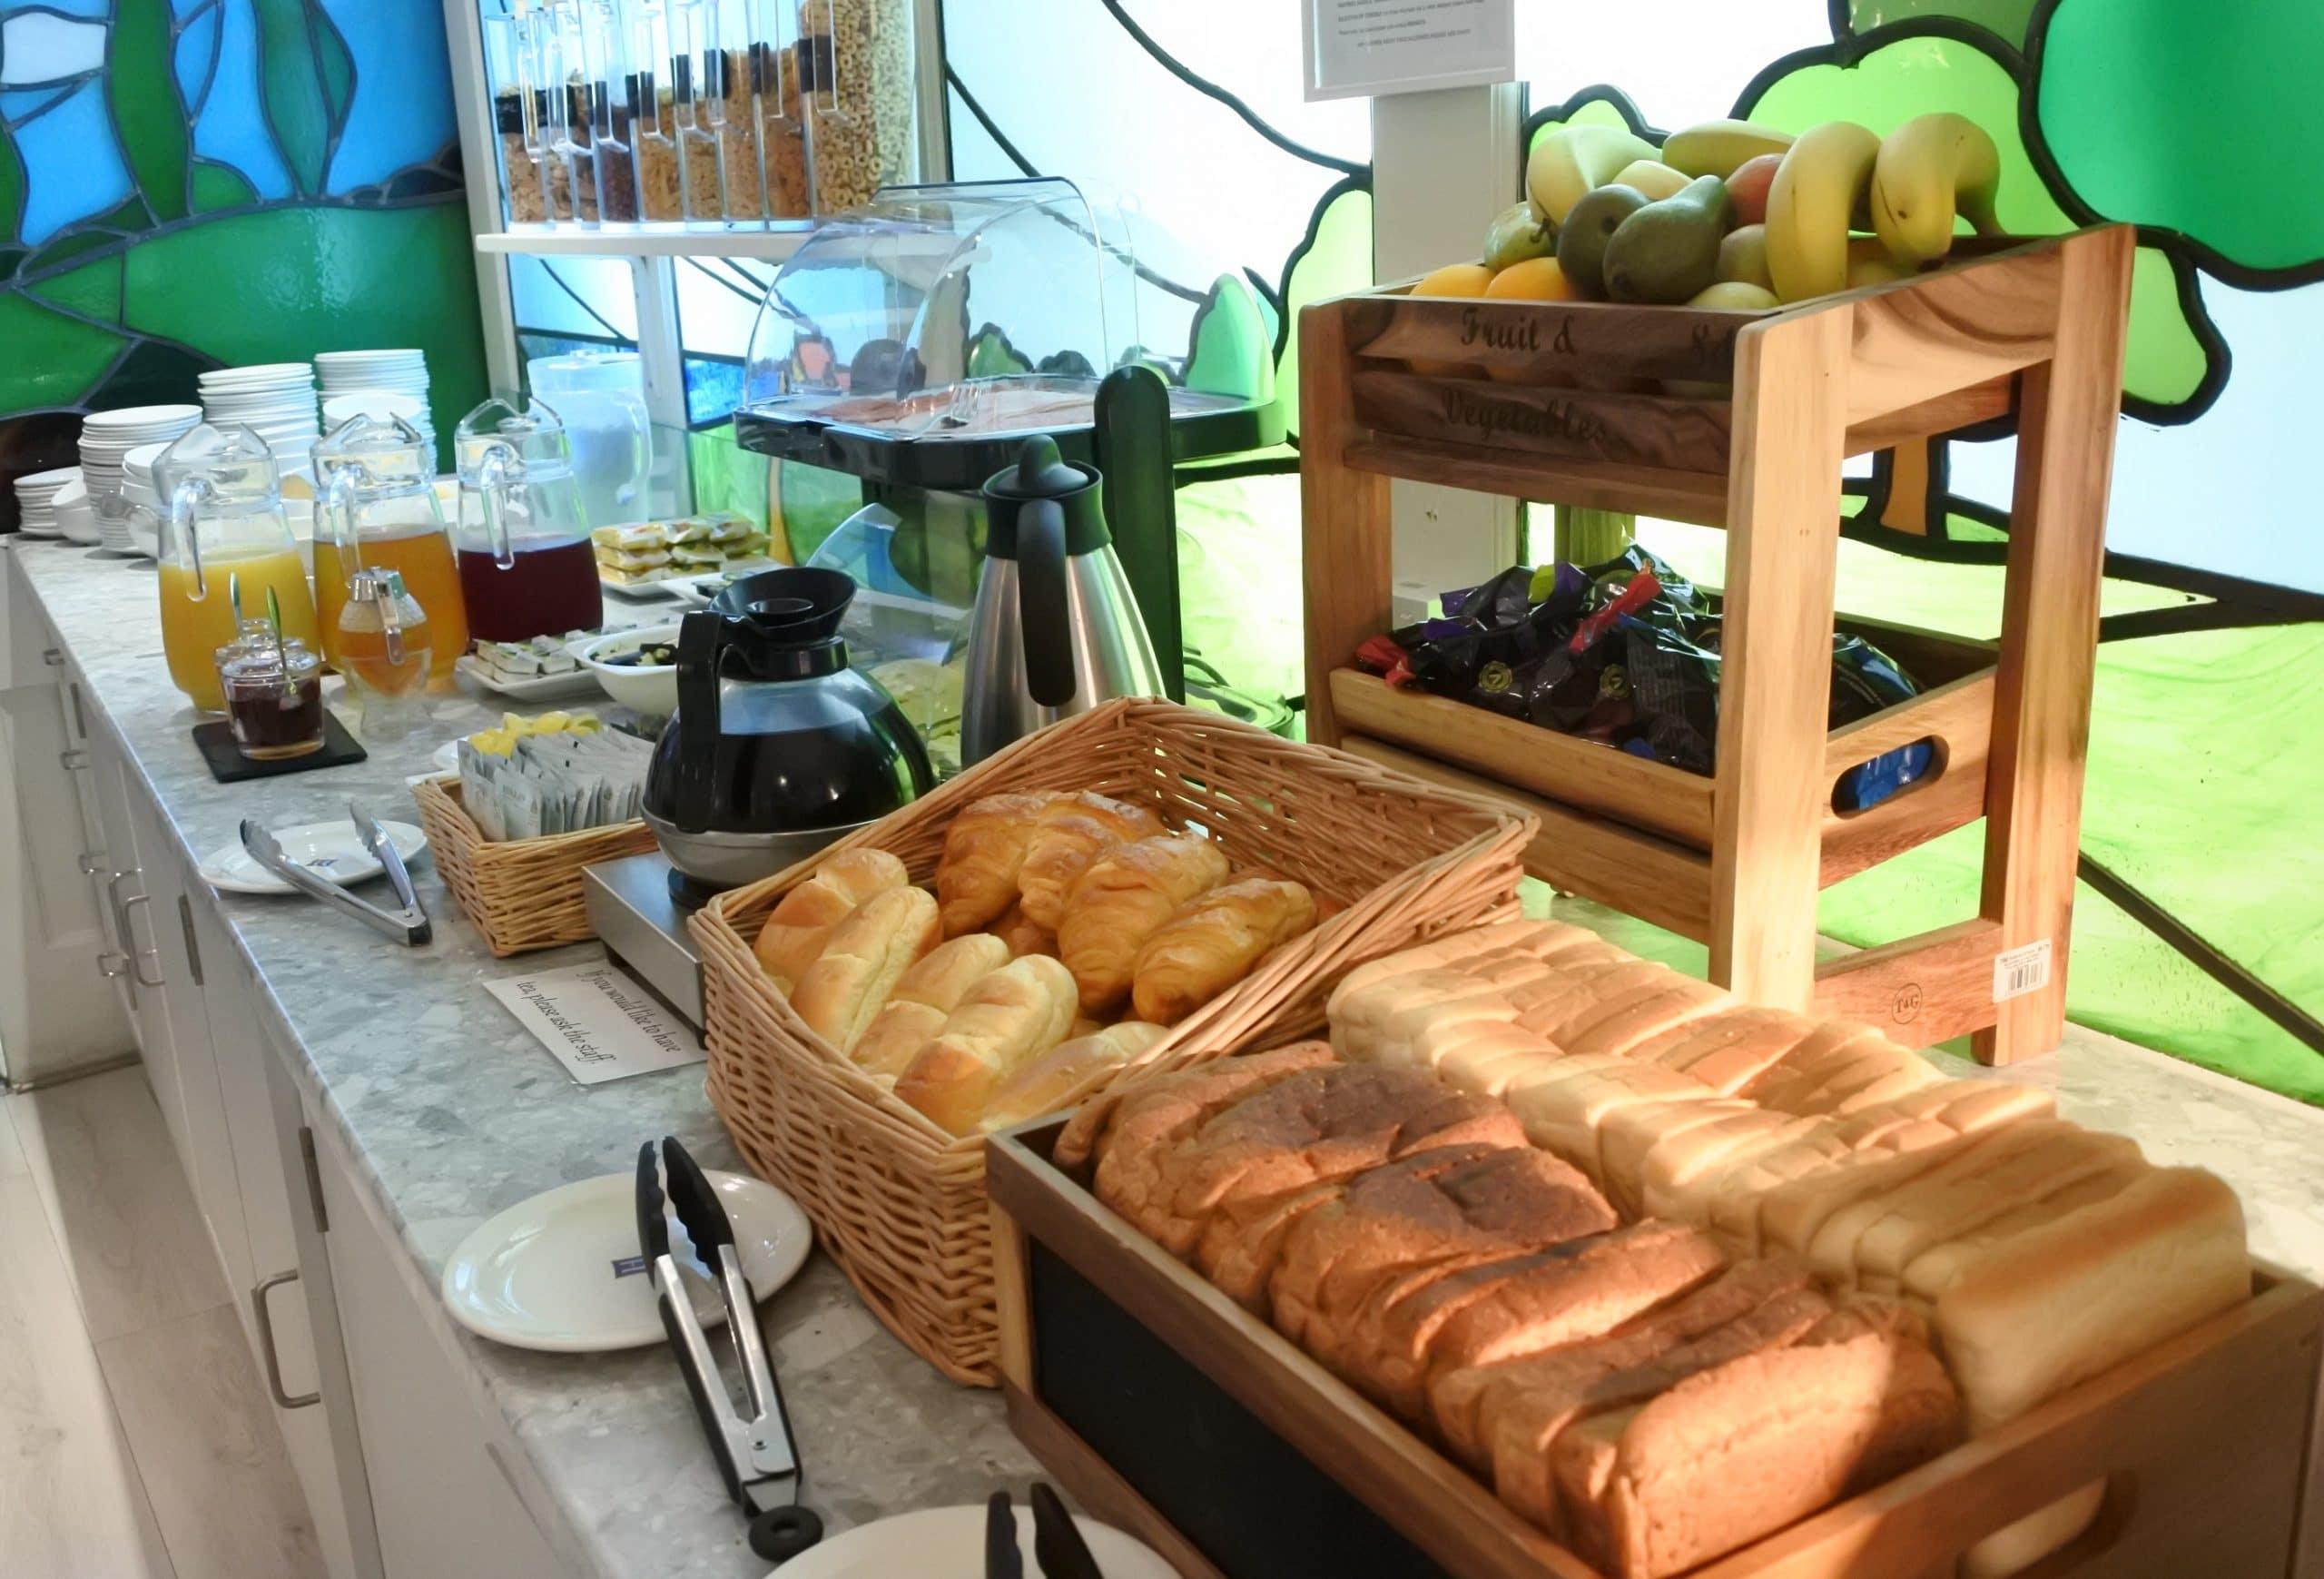 Breakfast at The Harlingford